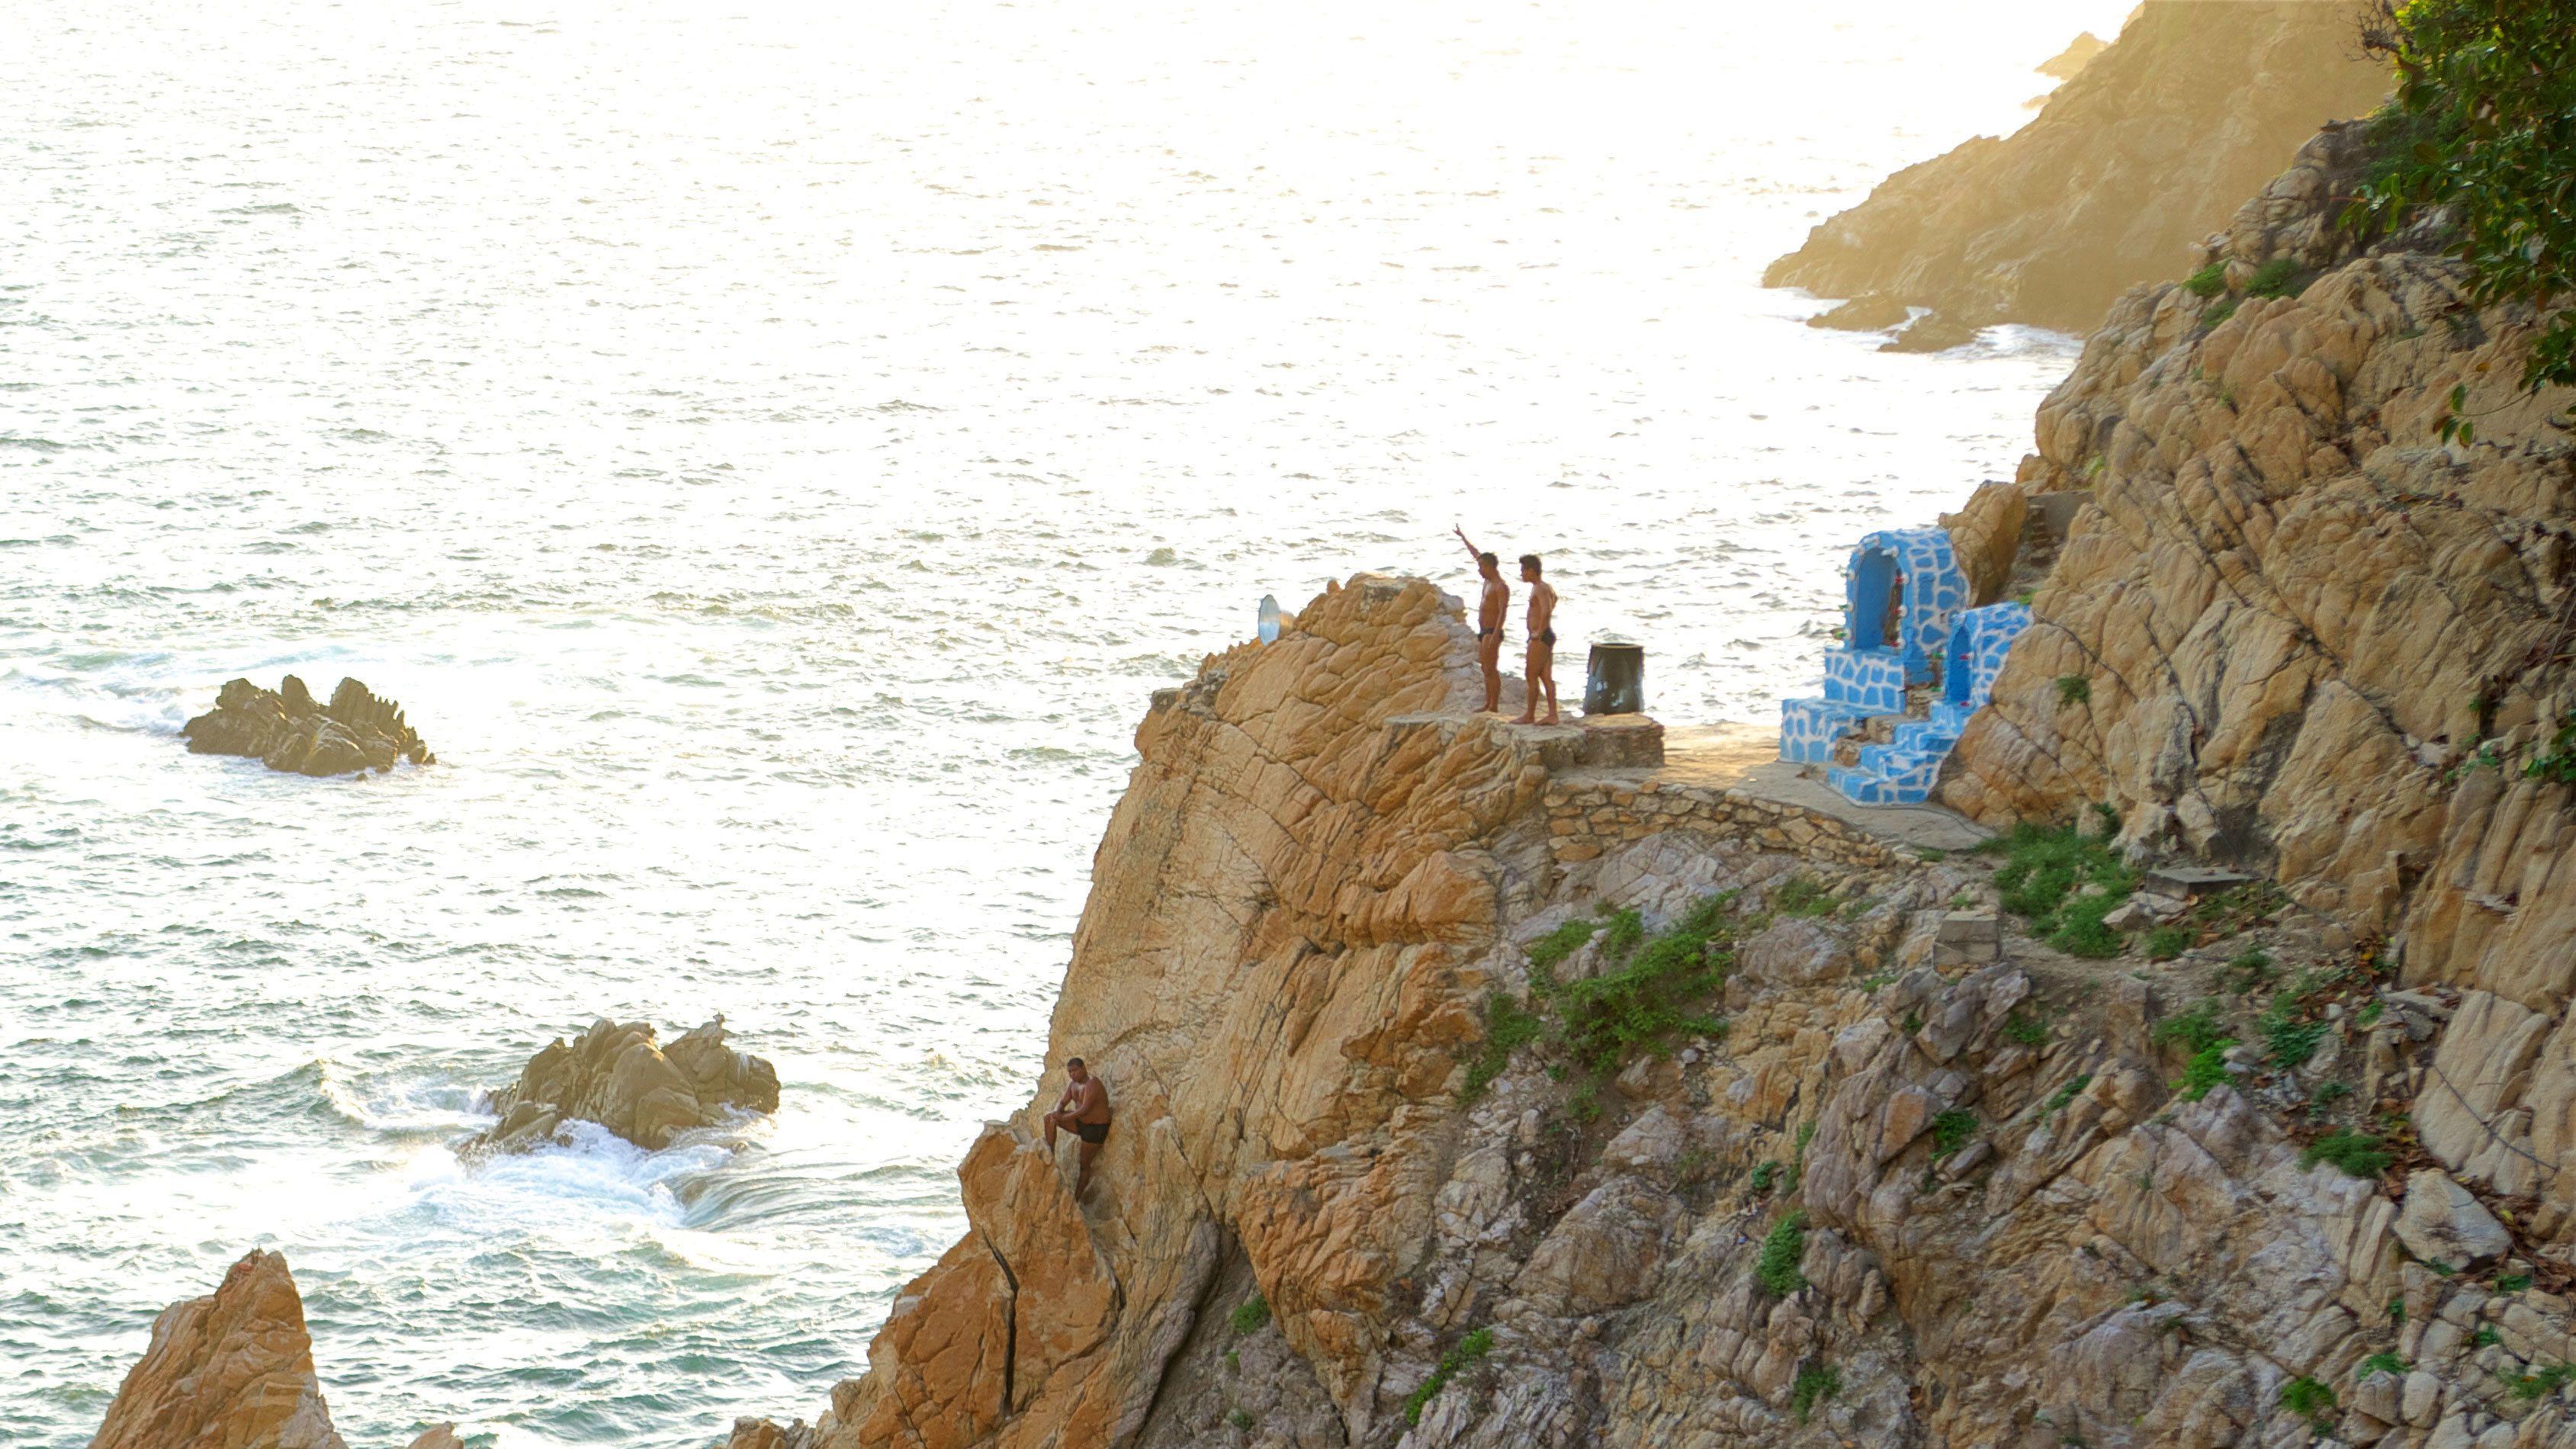 Cliff divers preparing to jump in Acapulco